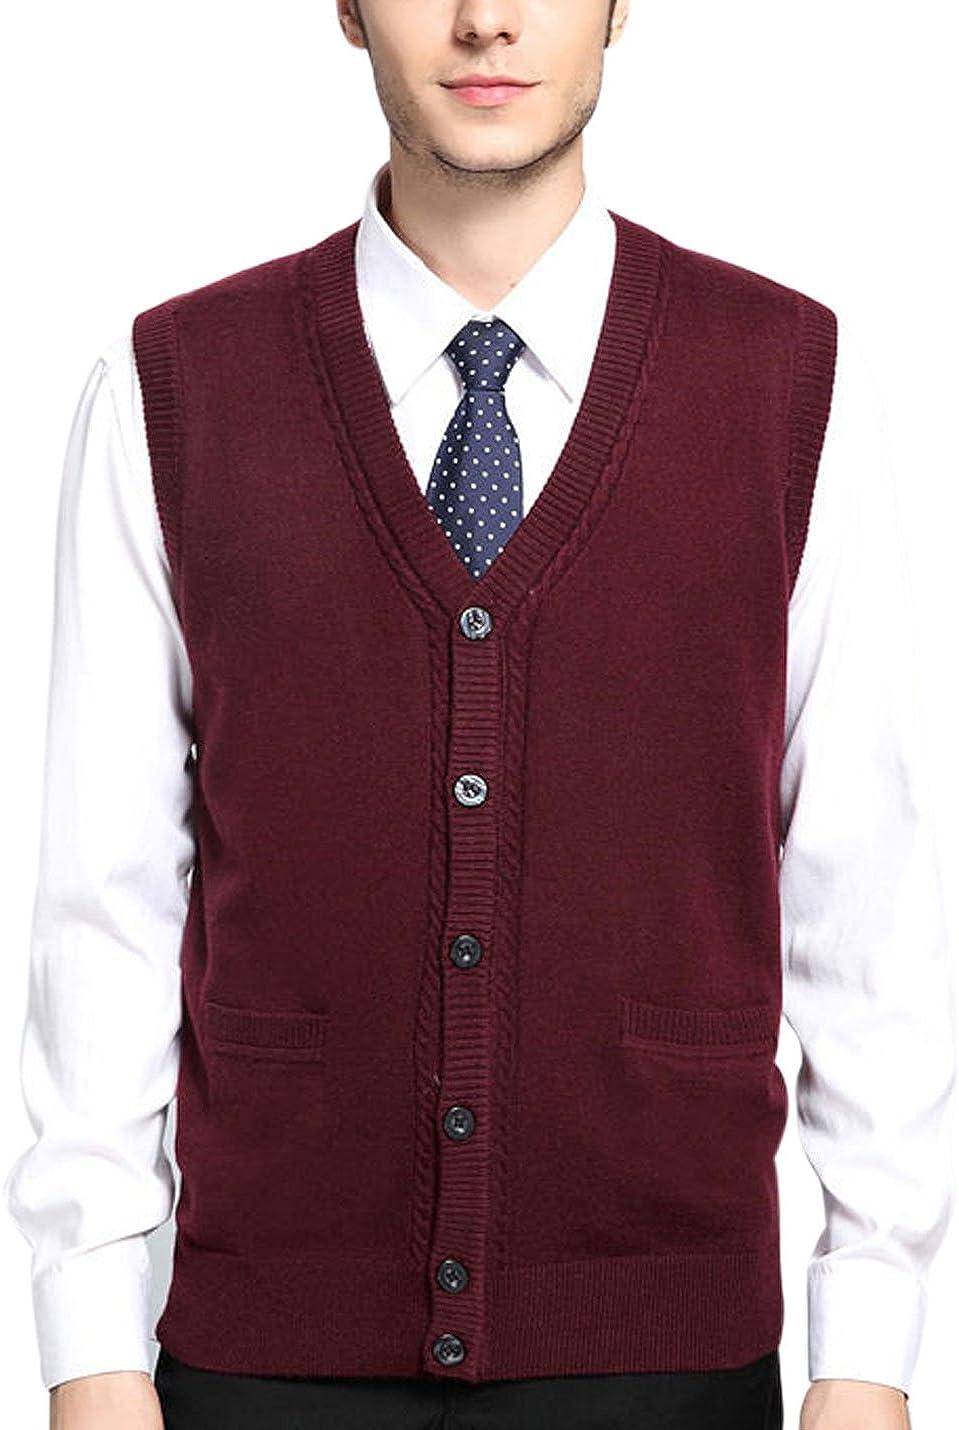 button up sweater vest for men